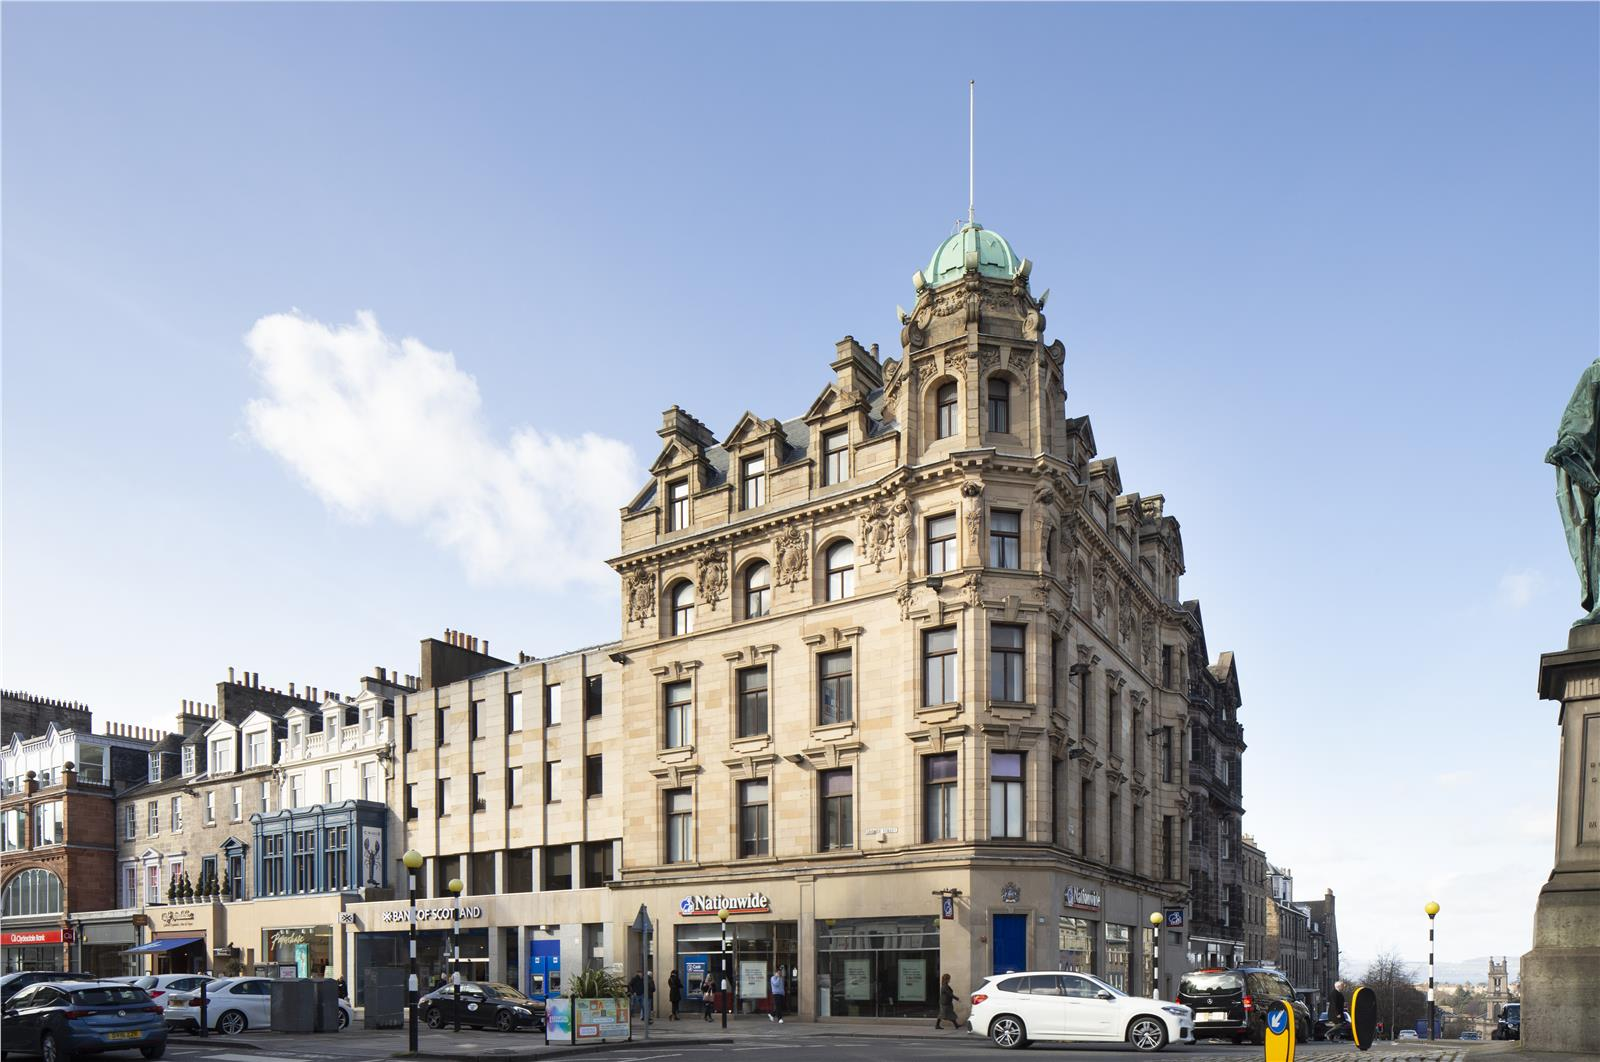 71 George Street, Edinburgh, City of Edinburgh, EH2